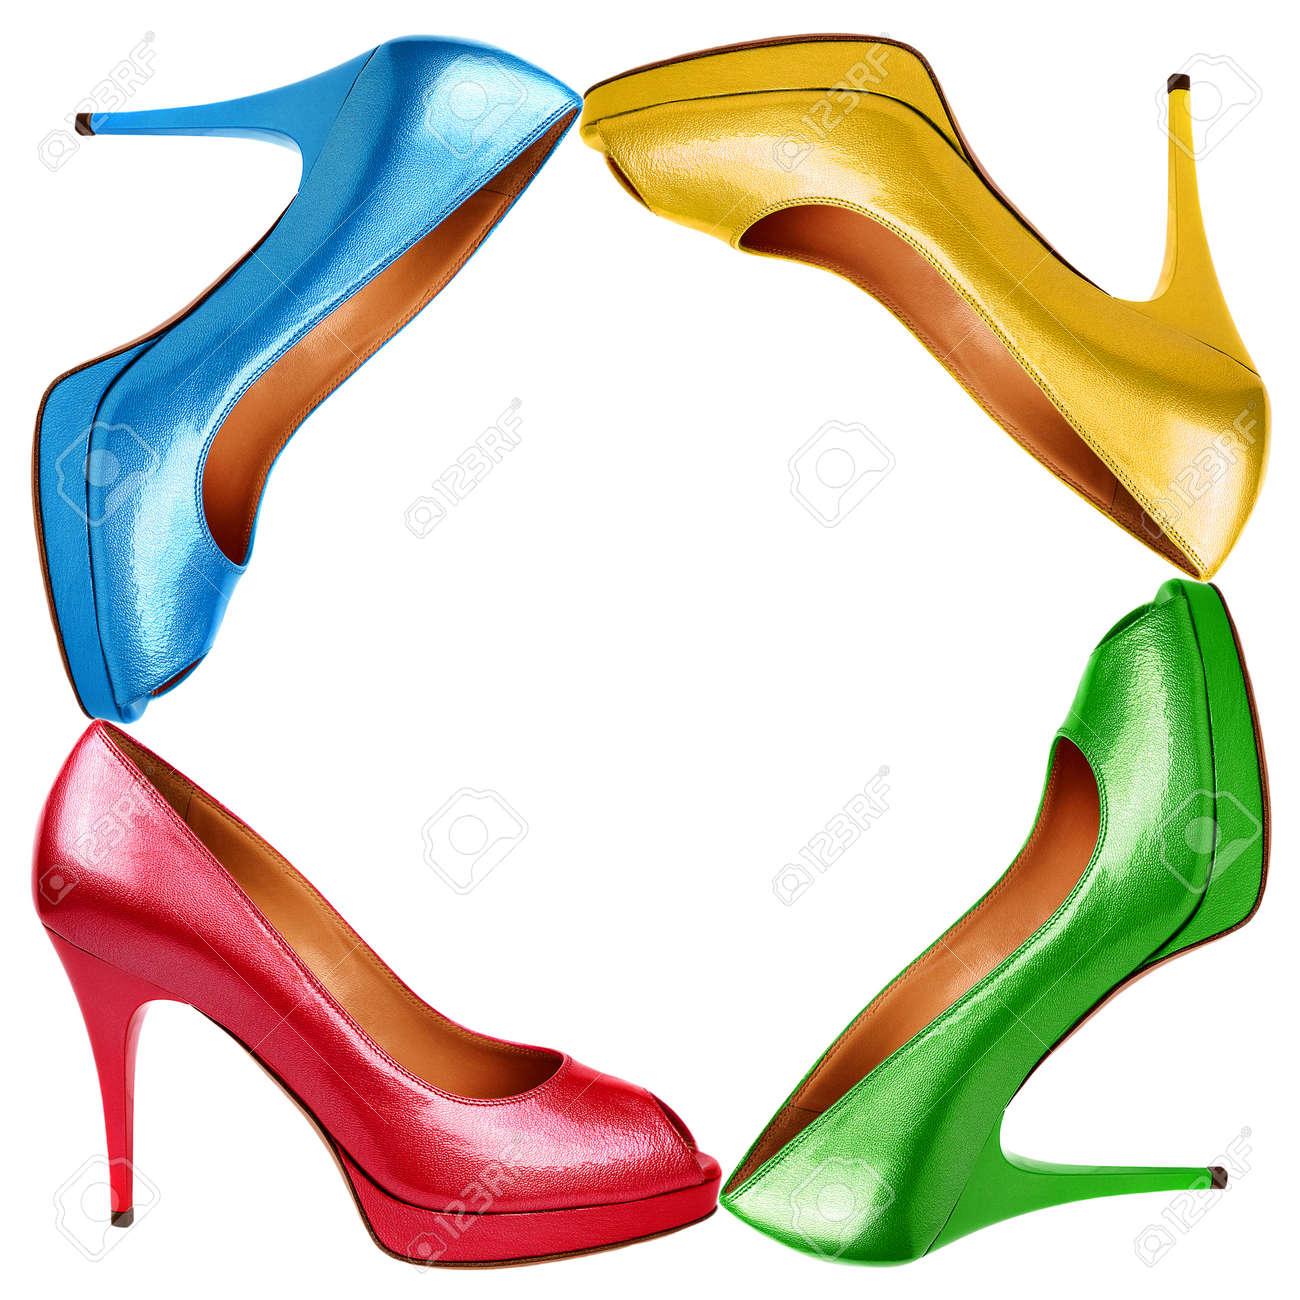 Multicolored female shoes background Stock Photo - 14513622